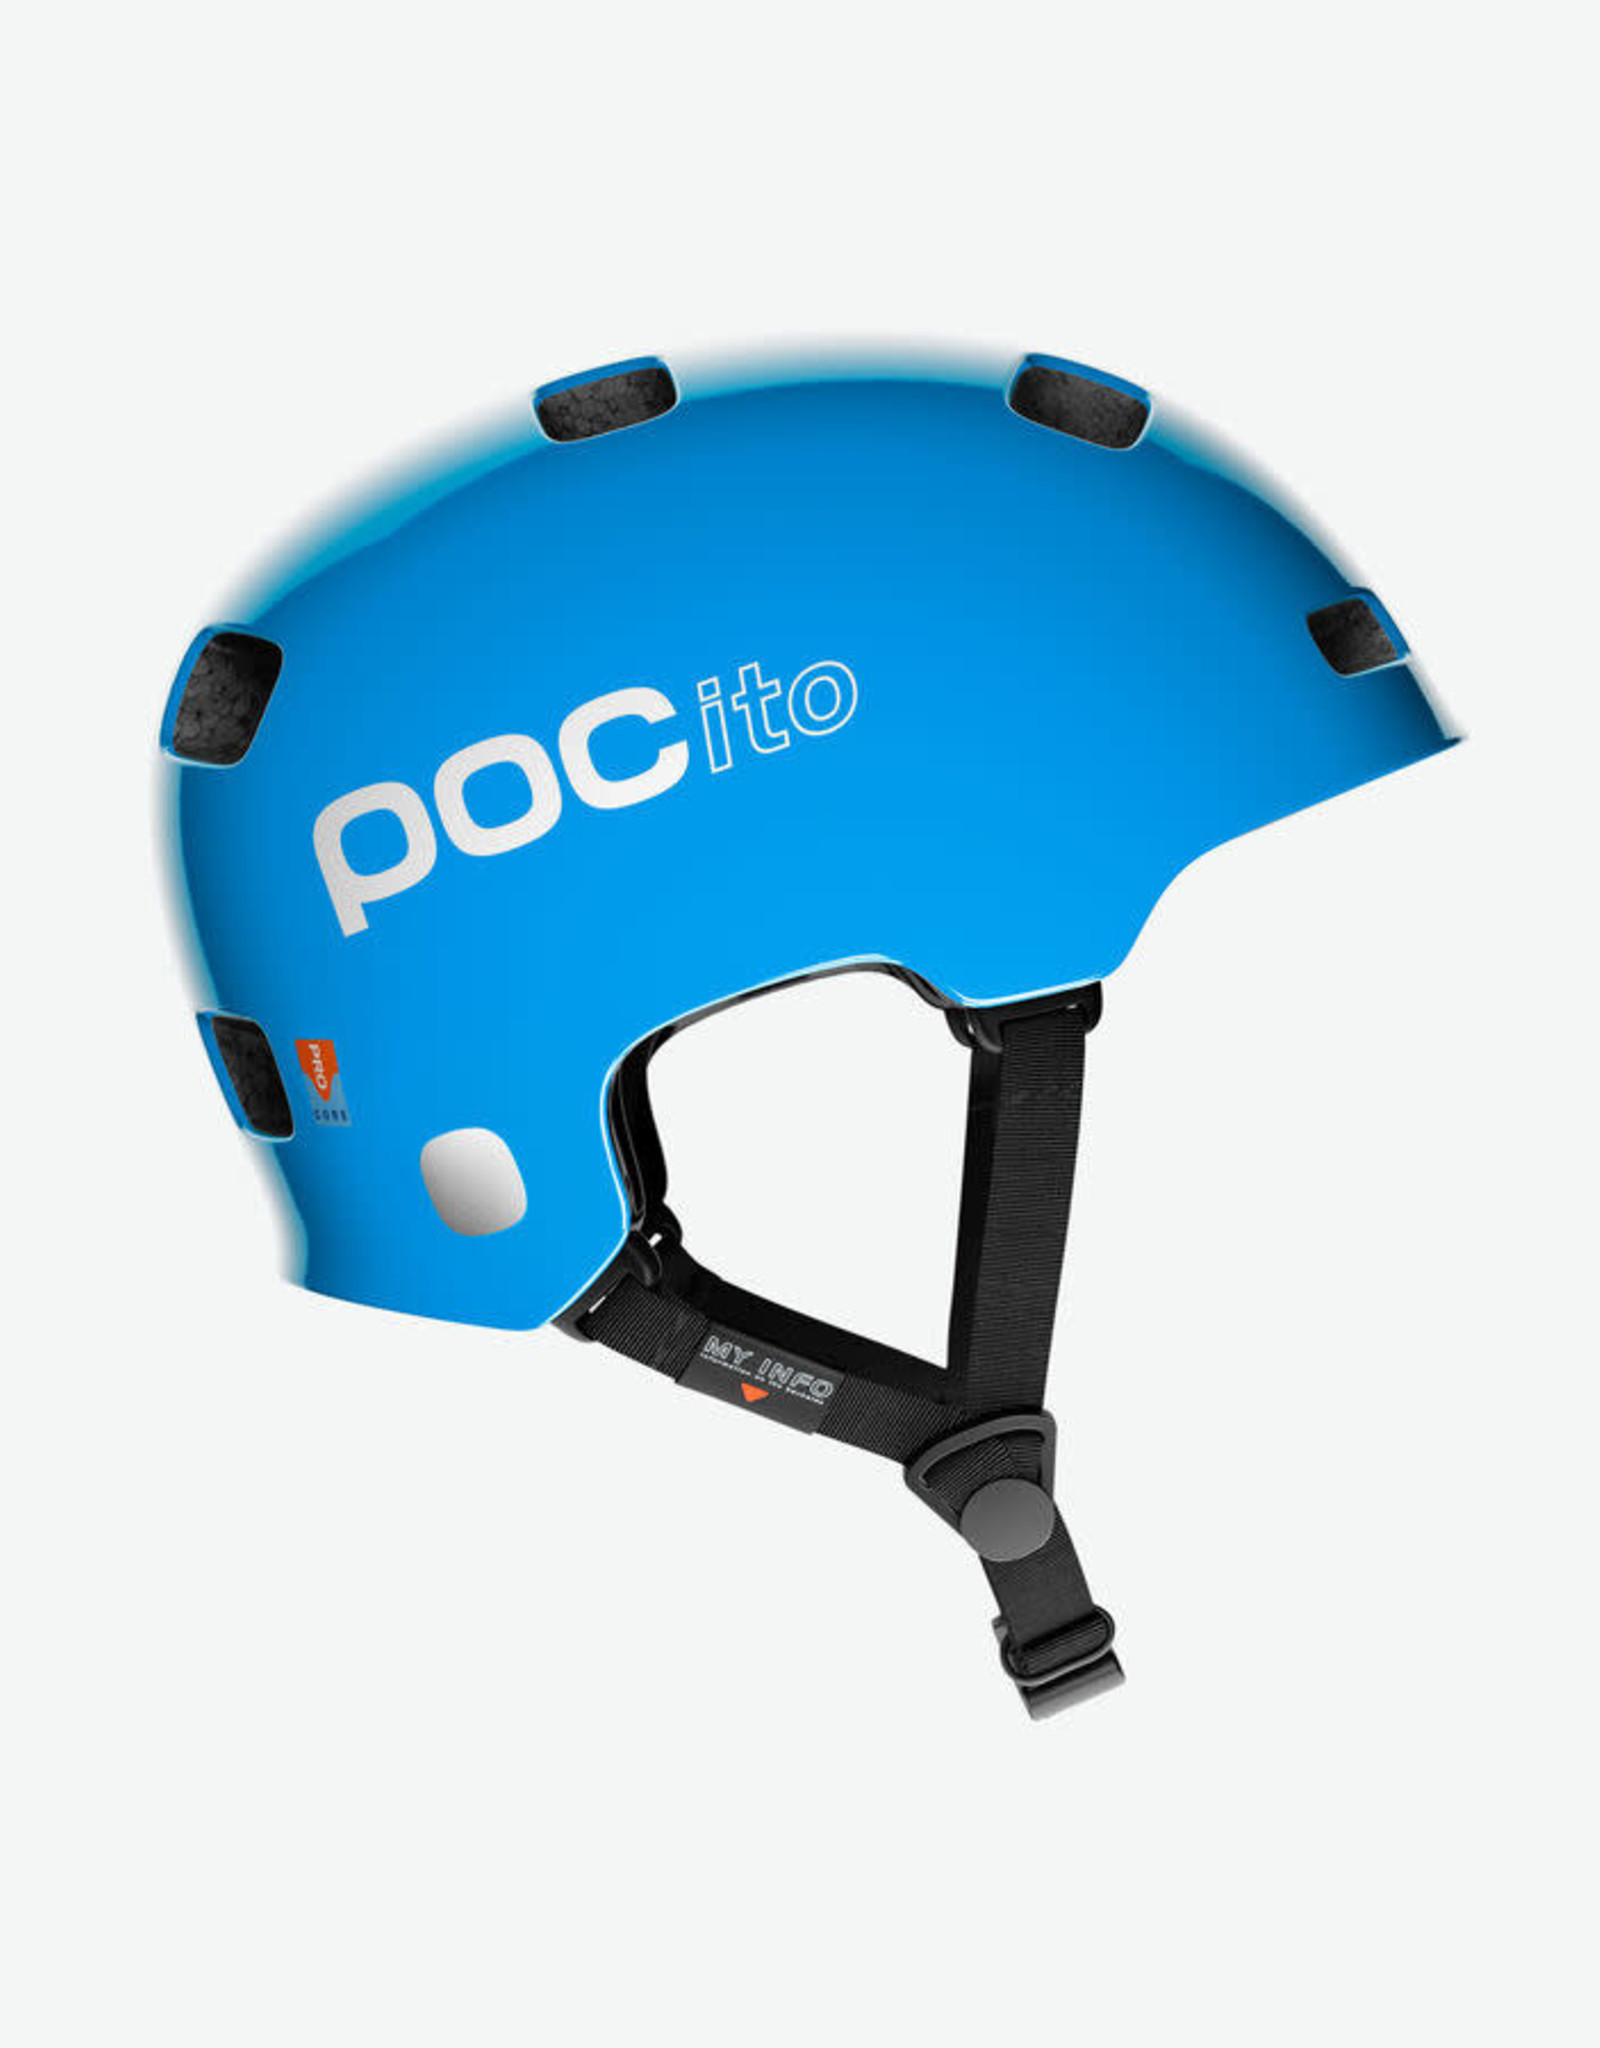 POC POCito Crane - Blauw